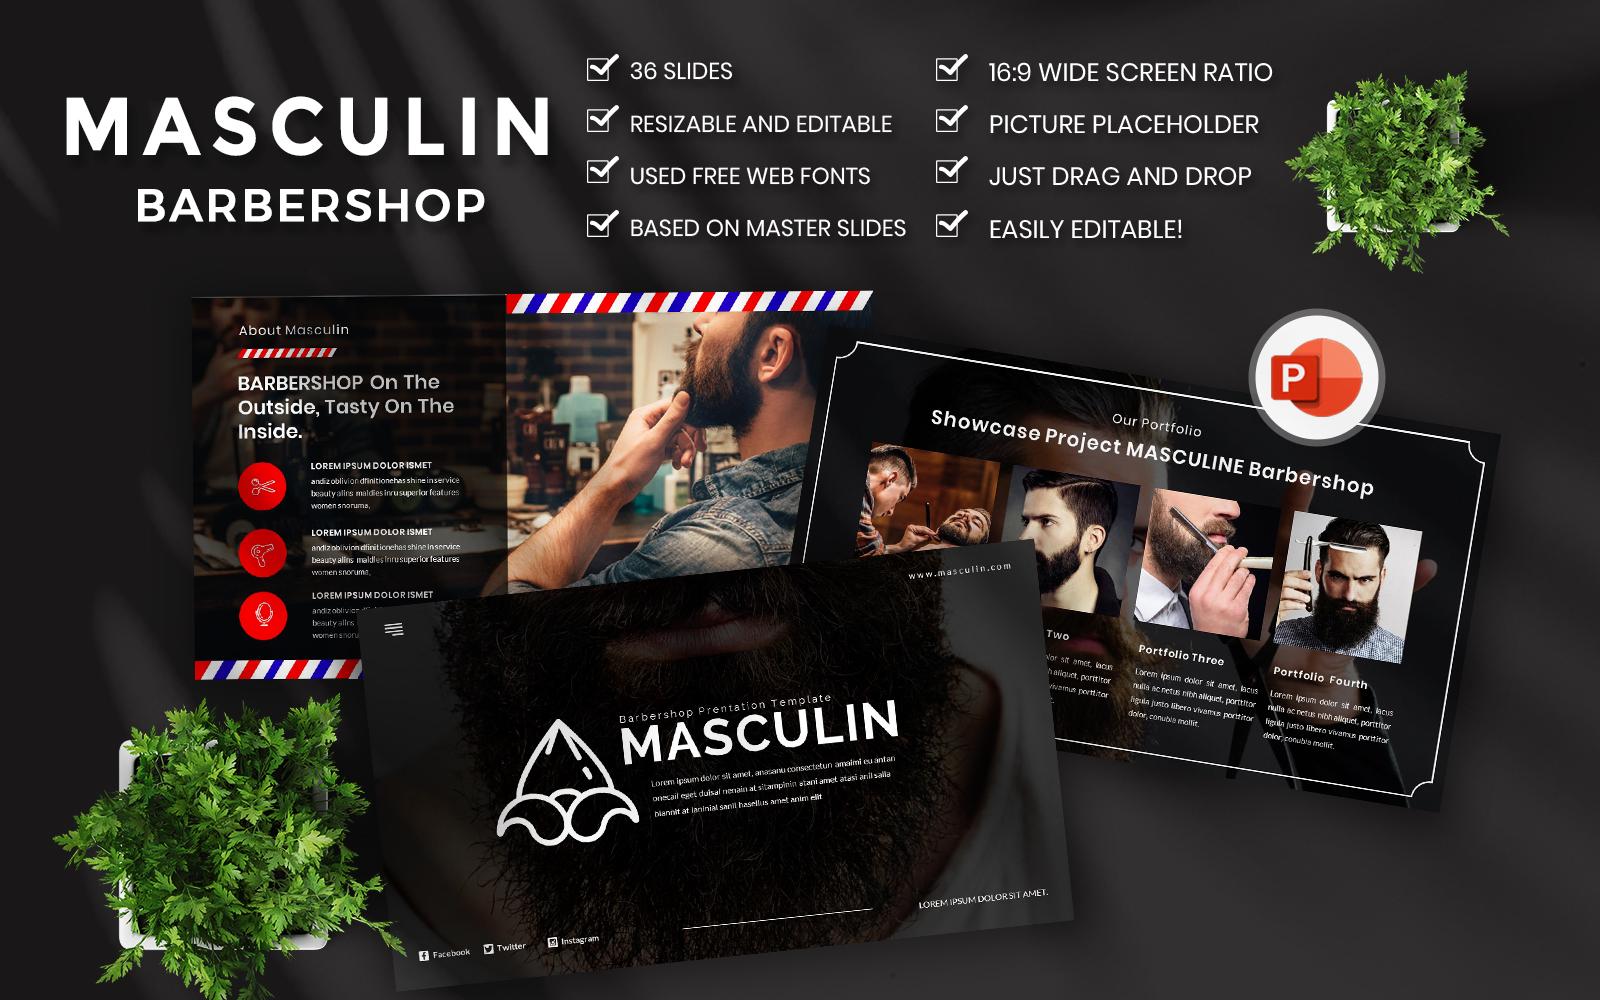 Masculine Barbershop PowerPoint Template